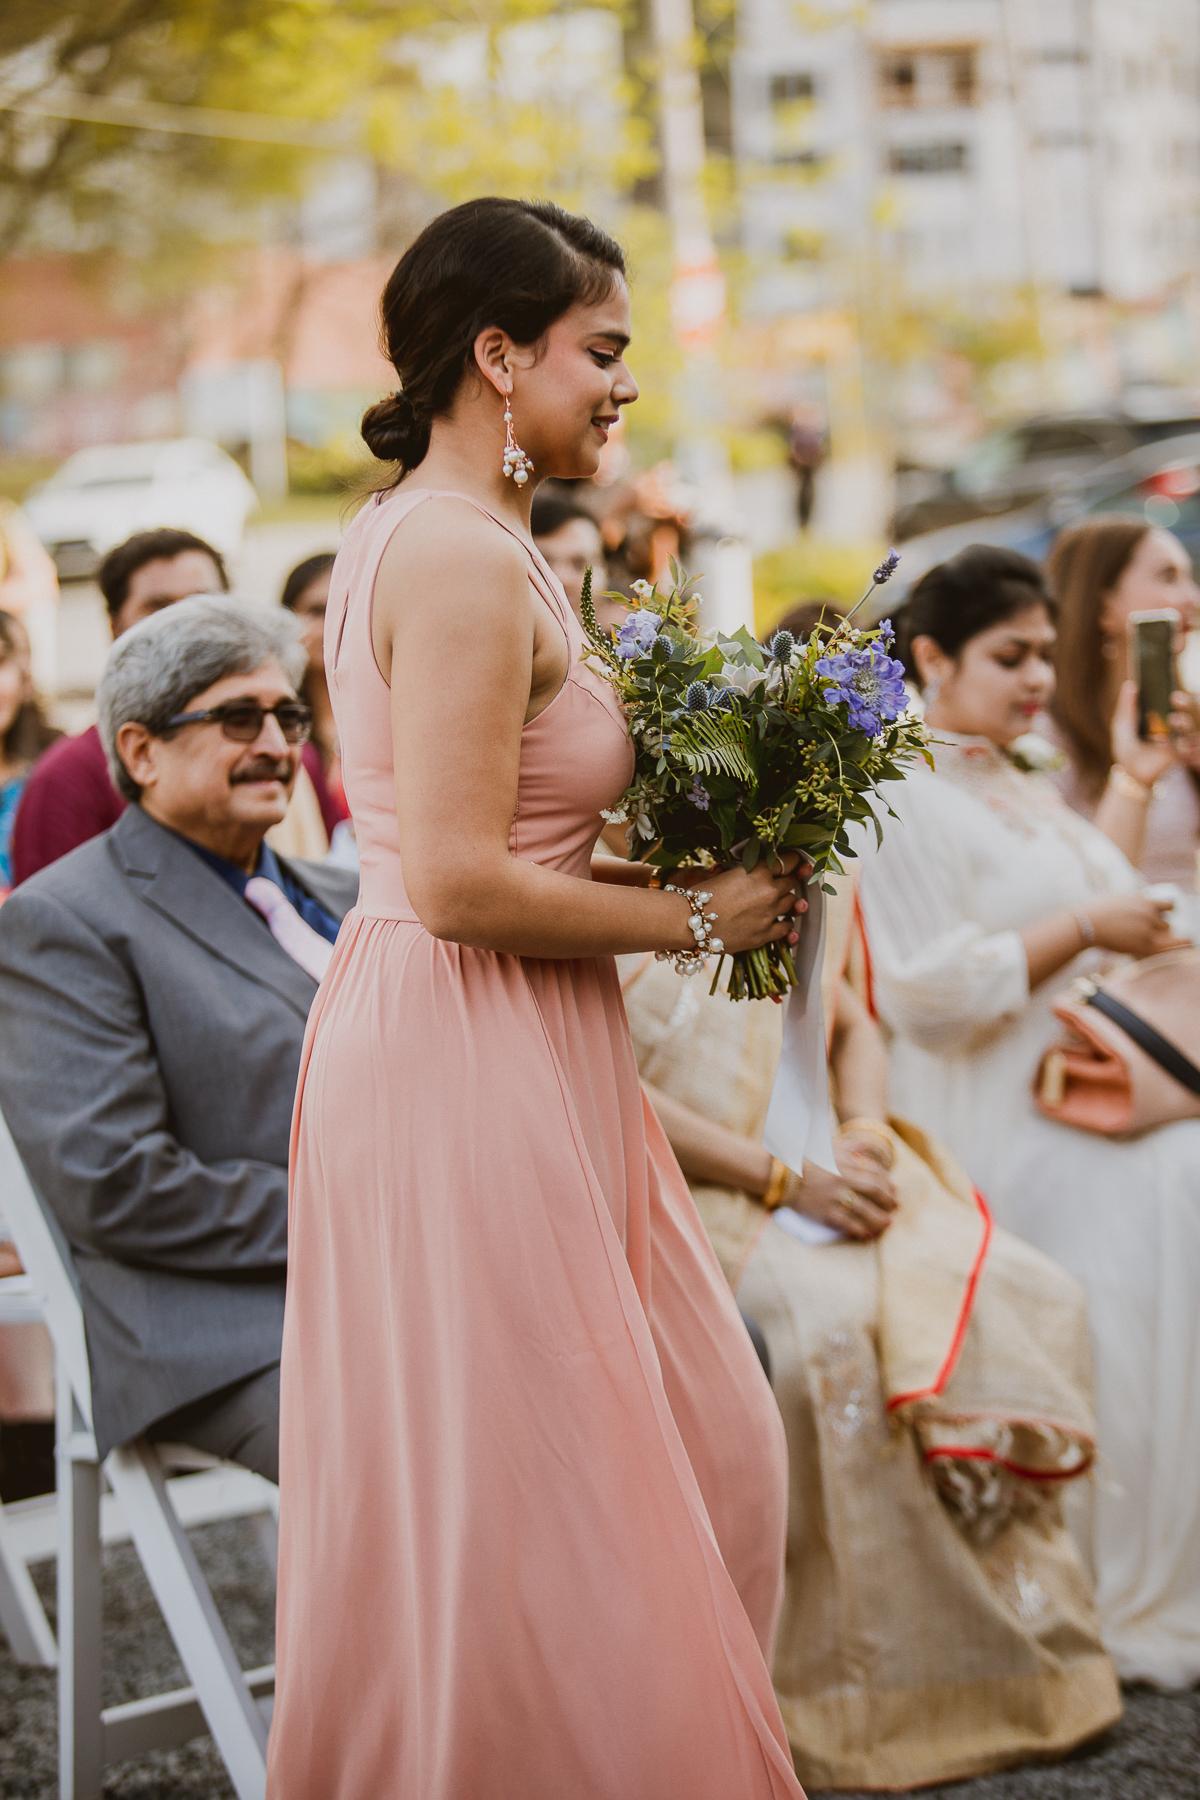 eventide-brewery-indian-american-fusion-kelley-raye-atlanta-los-angeles-wedding-photographer-49.jpg